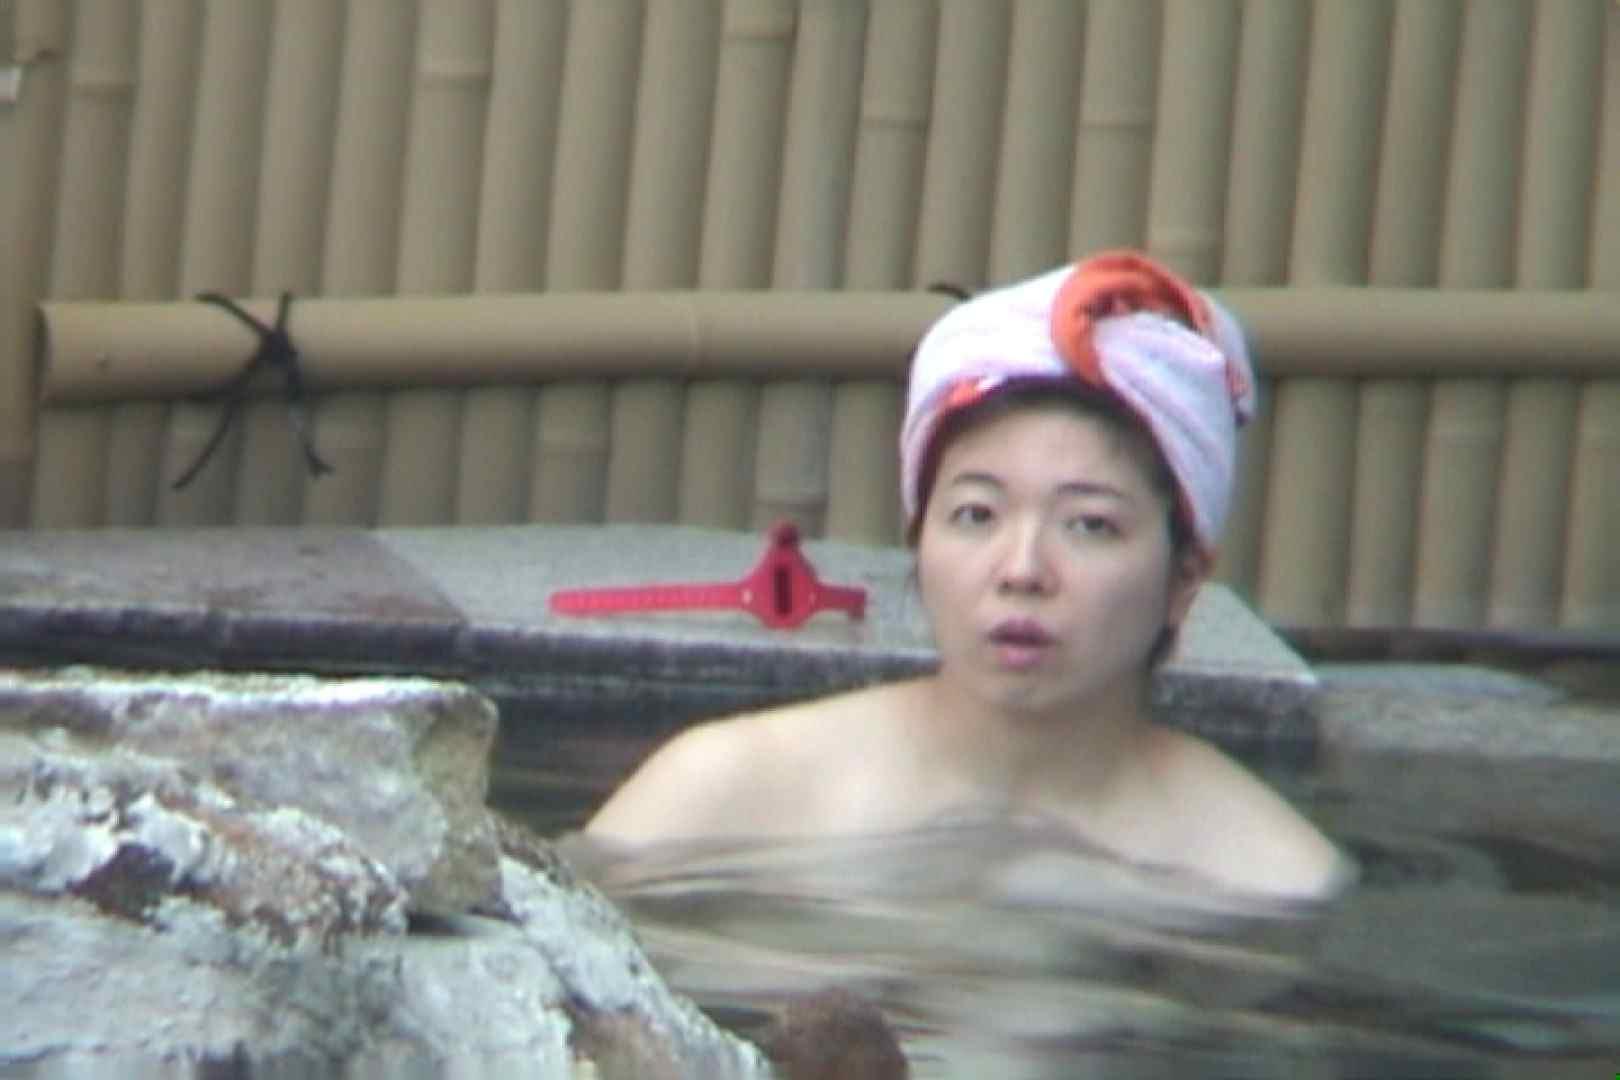 Aquaな露天風呂Vol.573 0   エッチな盗撮  84pic 1